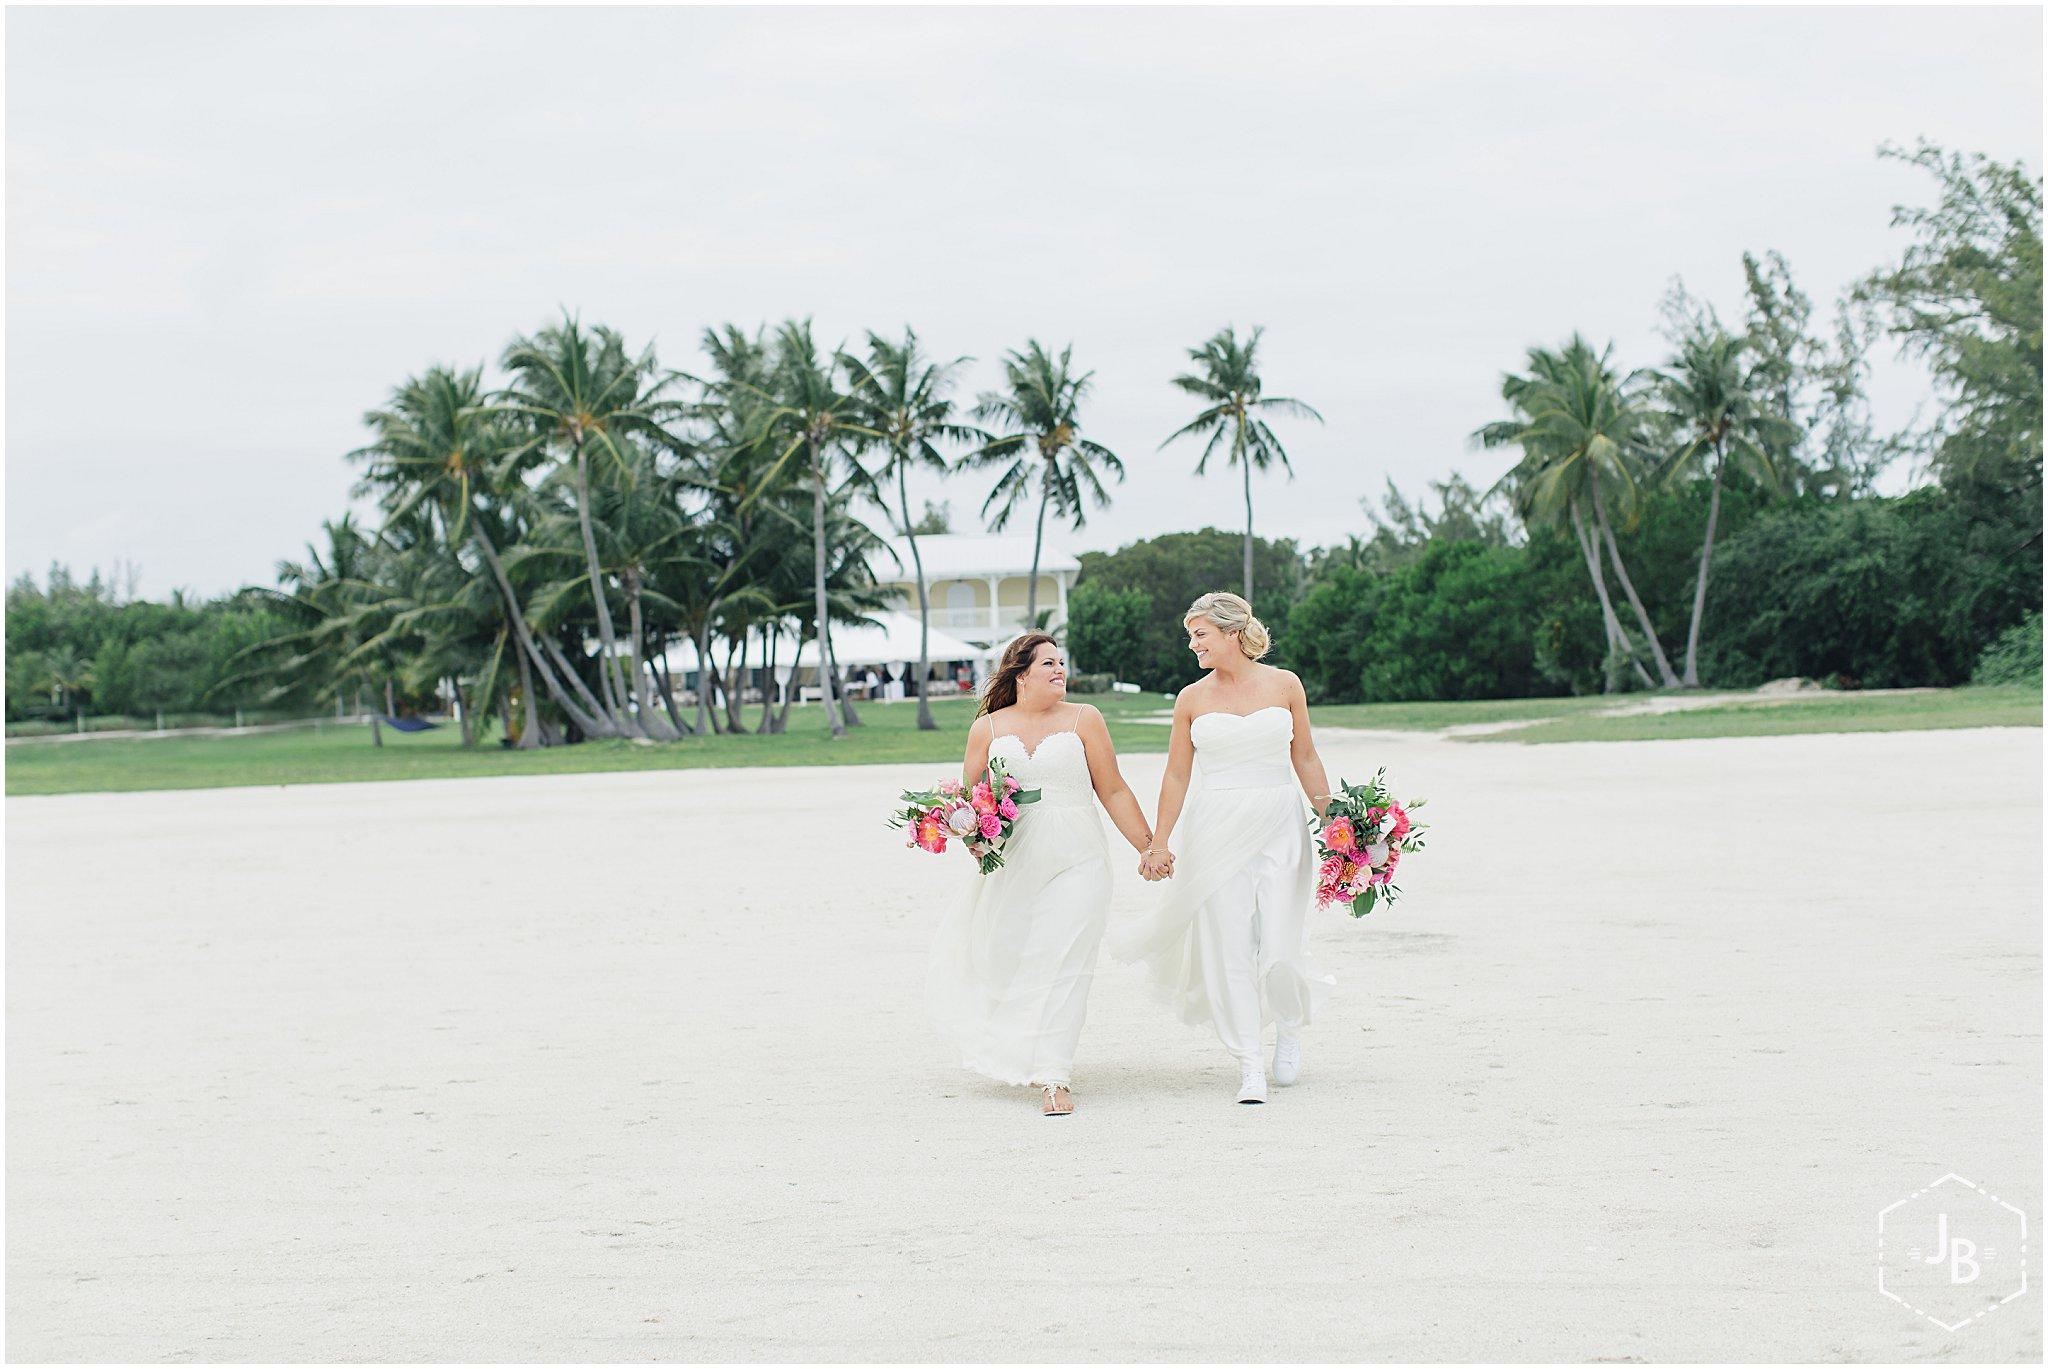 WeddingandEngagementFloridaPhotographer_1441.jpg